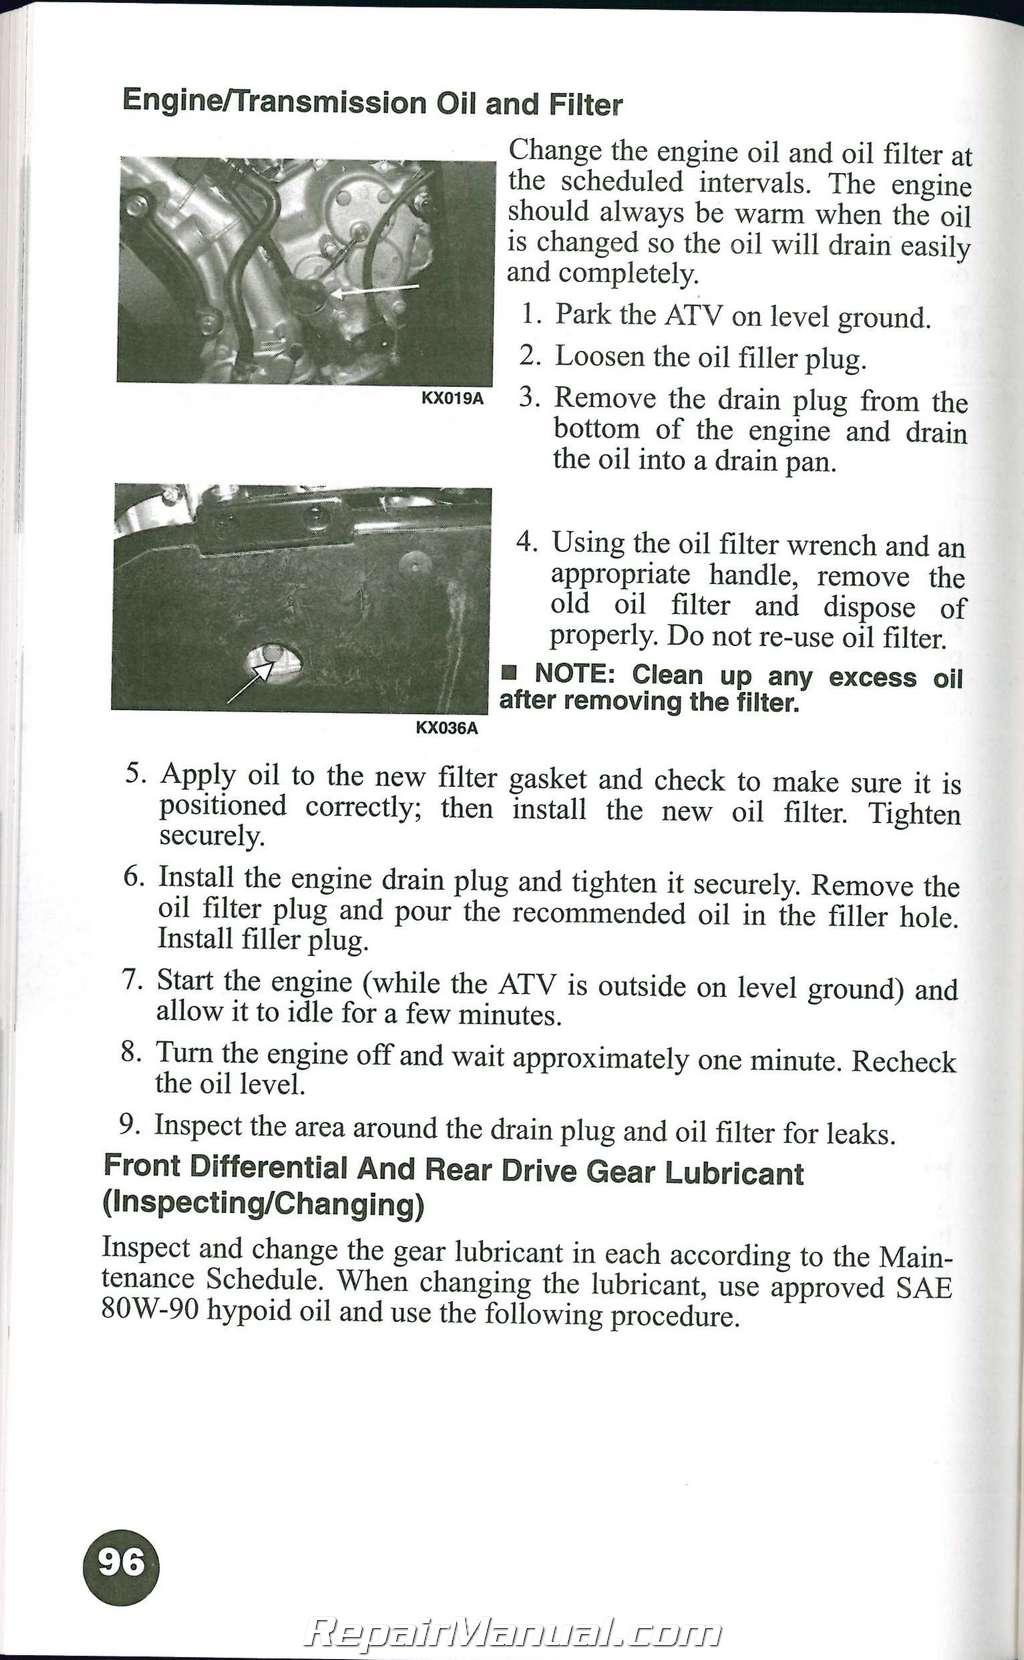 2004 arctic cat 650 twin atv owners manual rh repairmanual com Arctic Start Remote Starter Compustar Auto Security